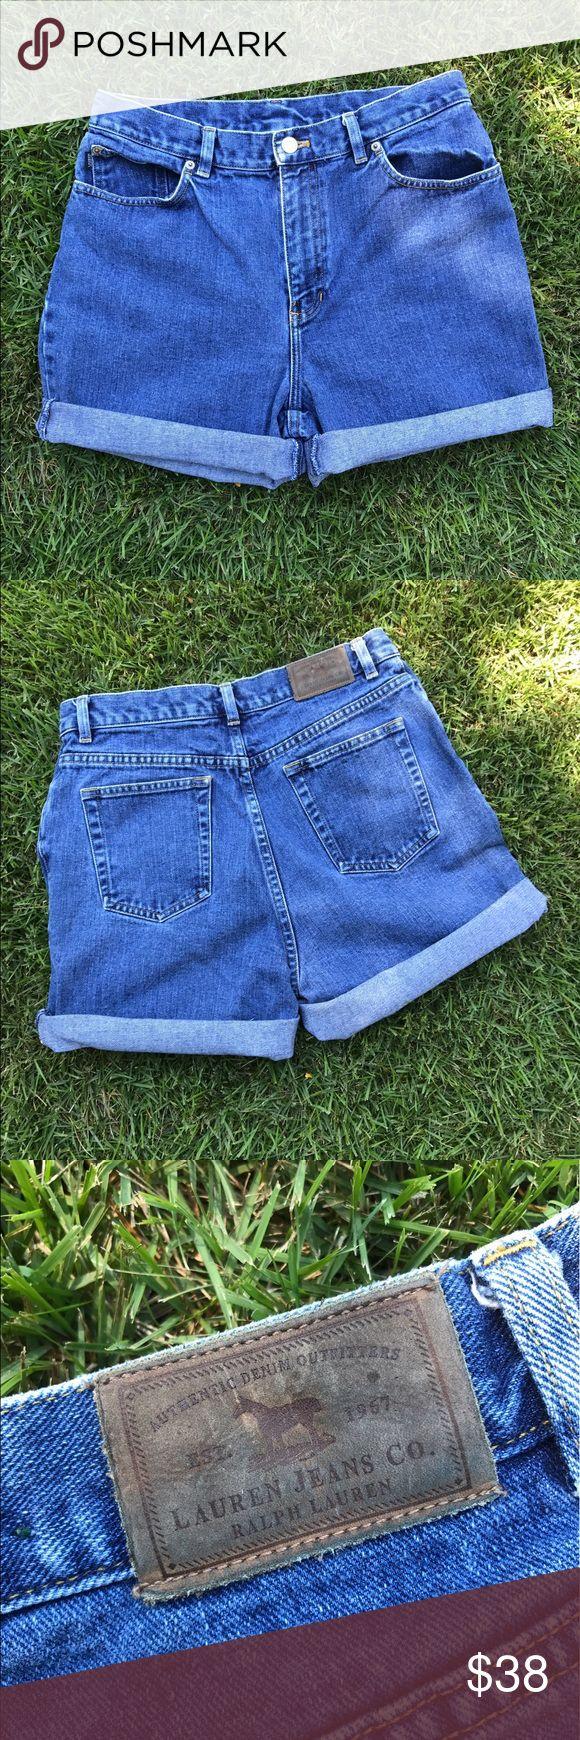 Vintage Ralph Lauren Shorts Super high waisted Ralph Lauren shorts. Waist size 30 and a women's size 10, but fits an 8 as well. Feel free to make an offer! Ralph Lauren Shorts Jean Shorts